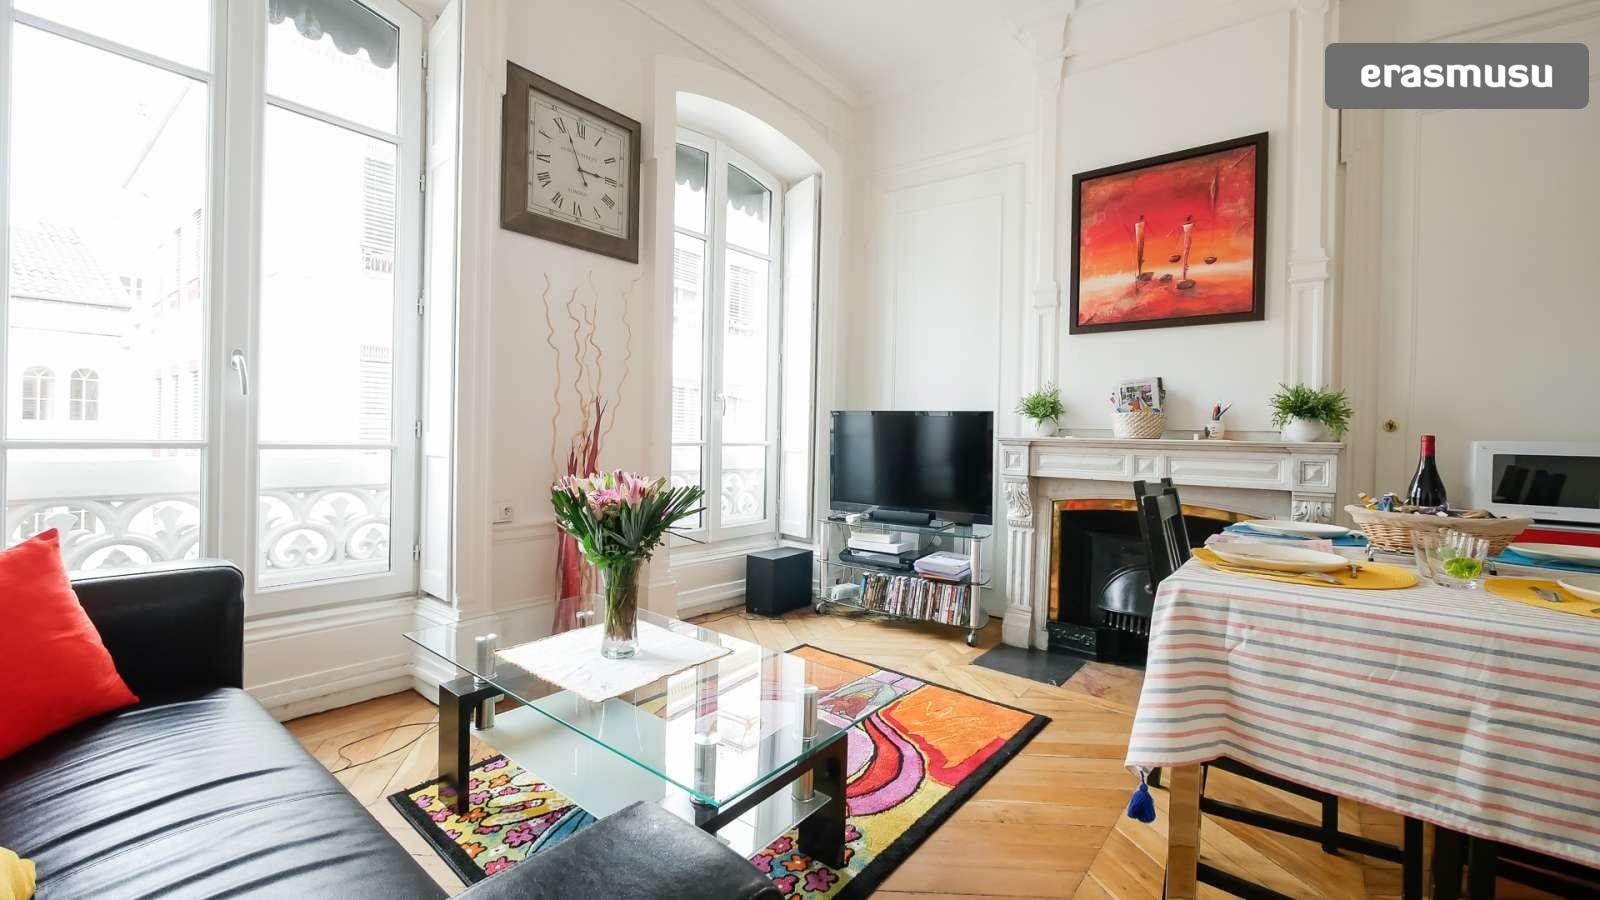 spacious-2-bedroom-apartment-rent-cordeliers-592e7d1f80aae930aa6